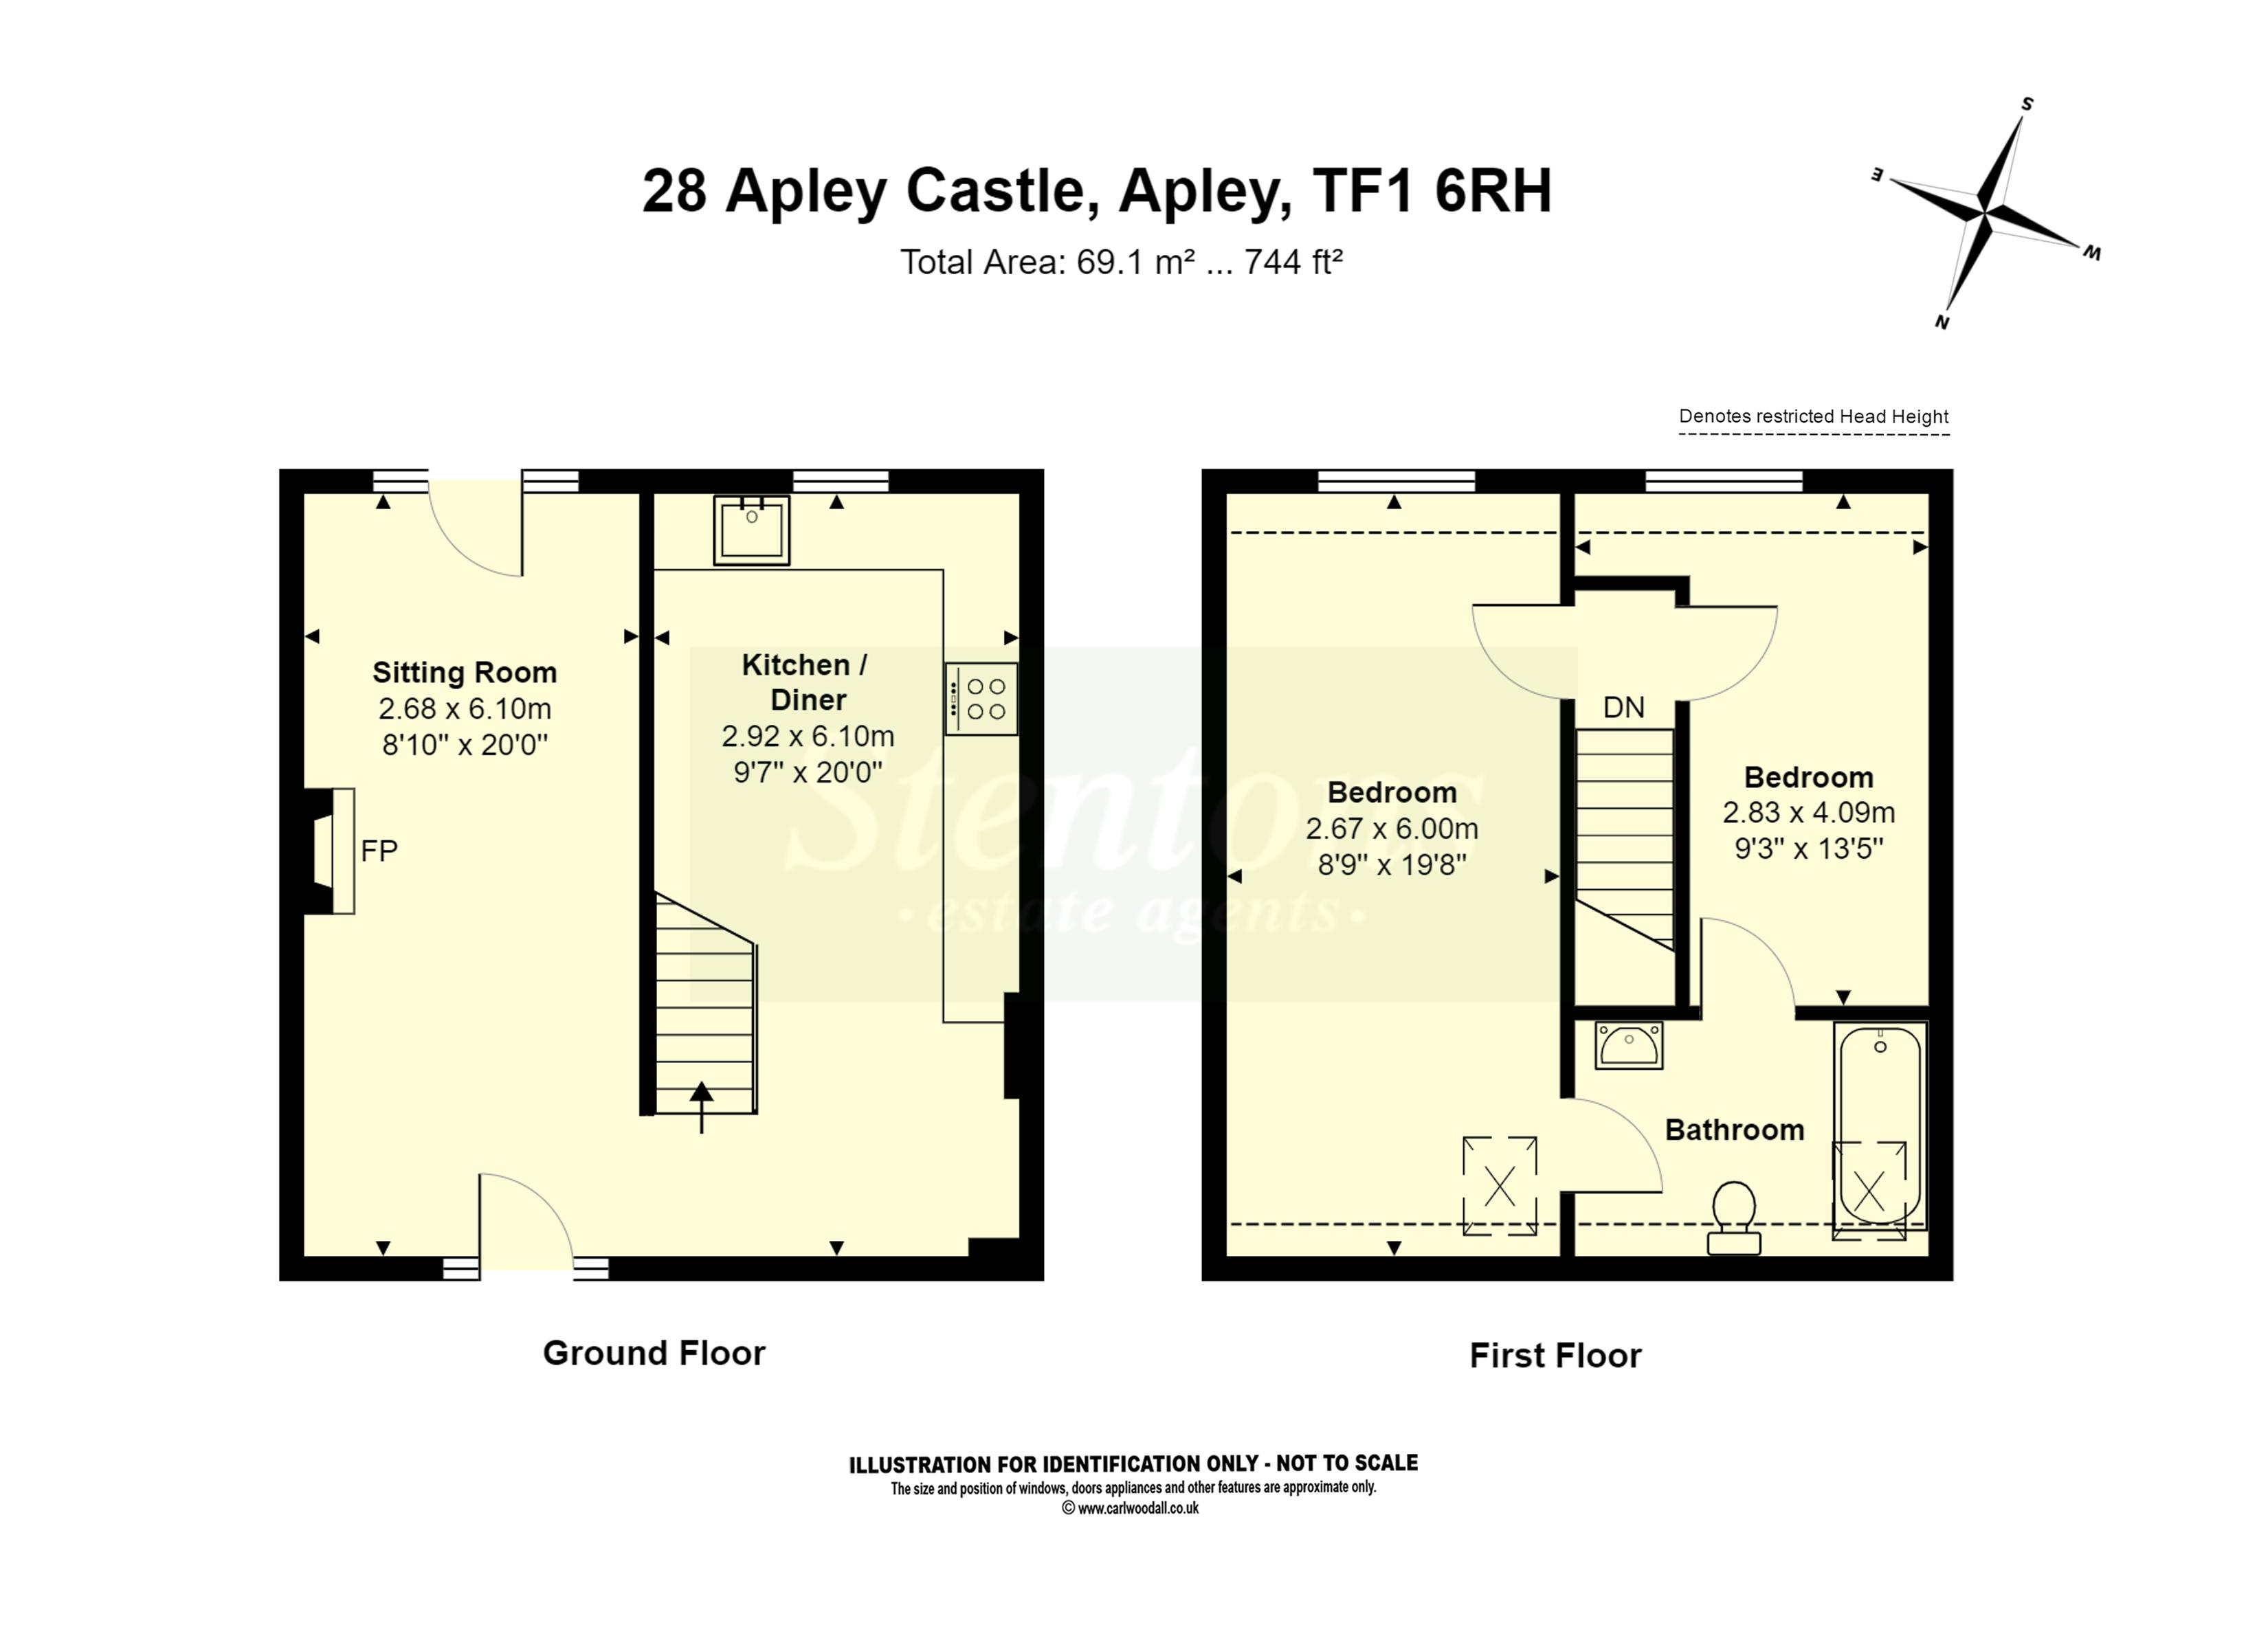 28 Apley Castle Apley